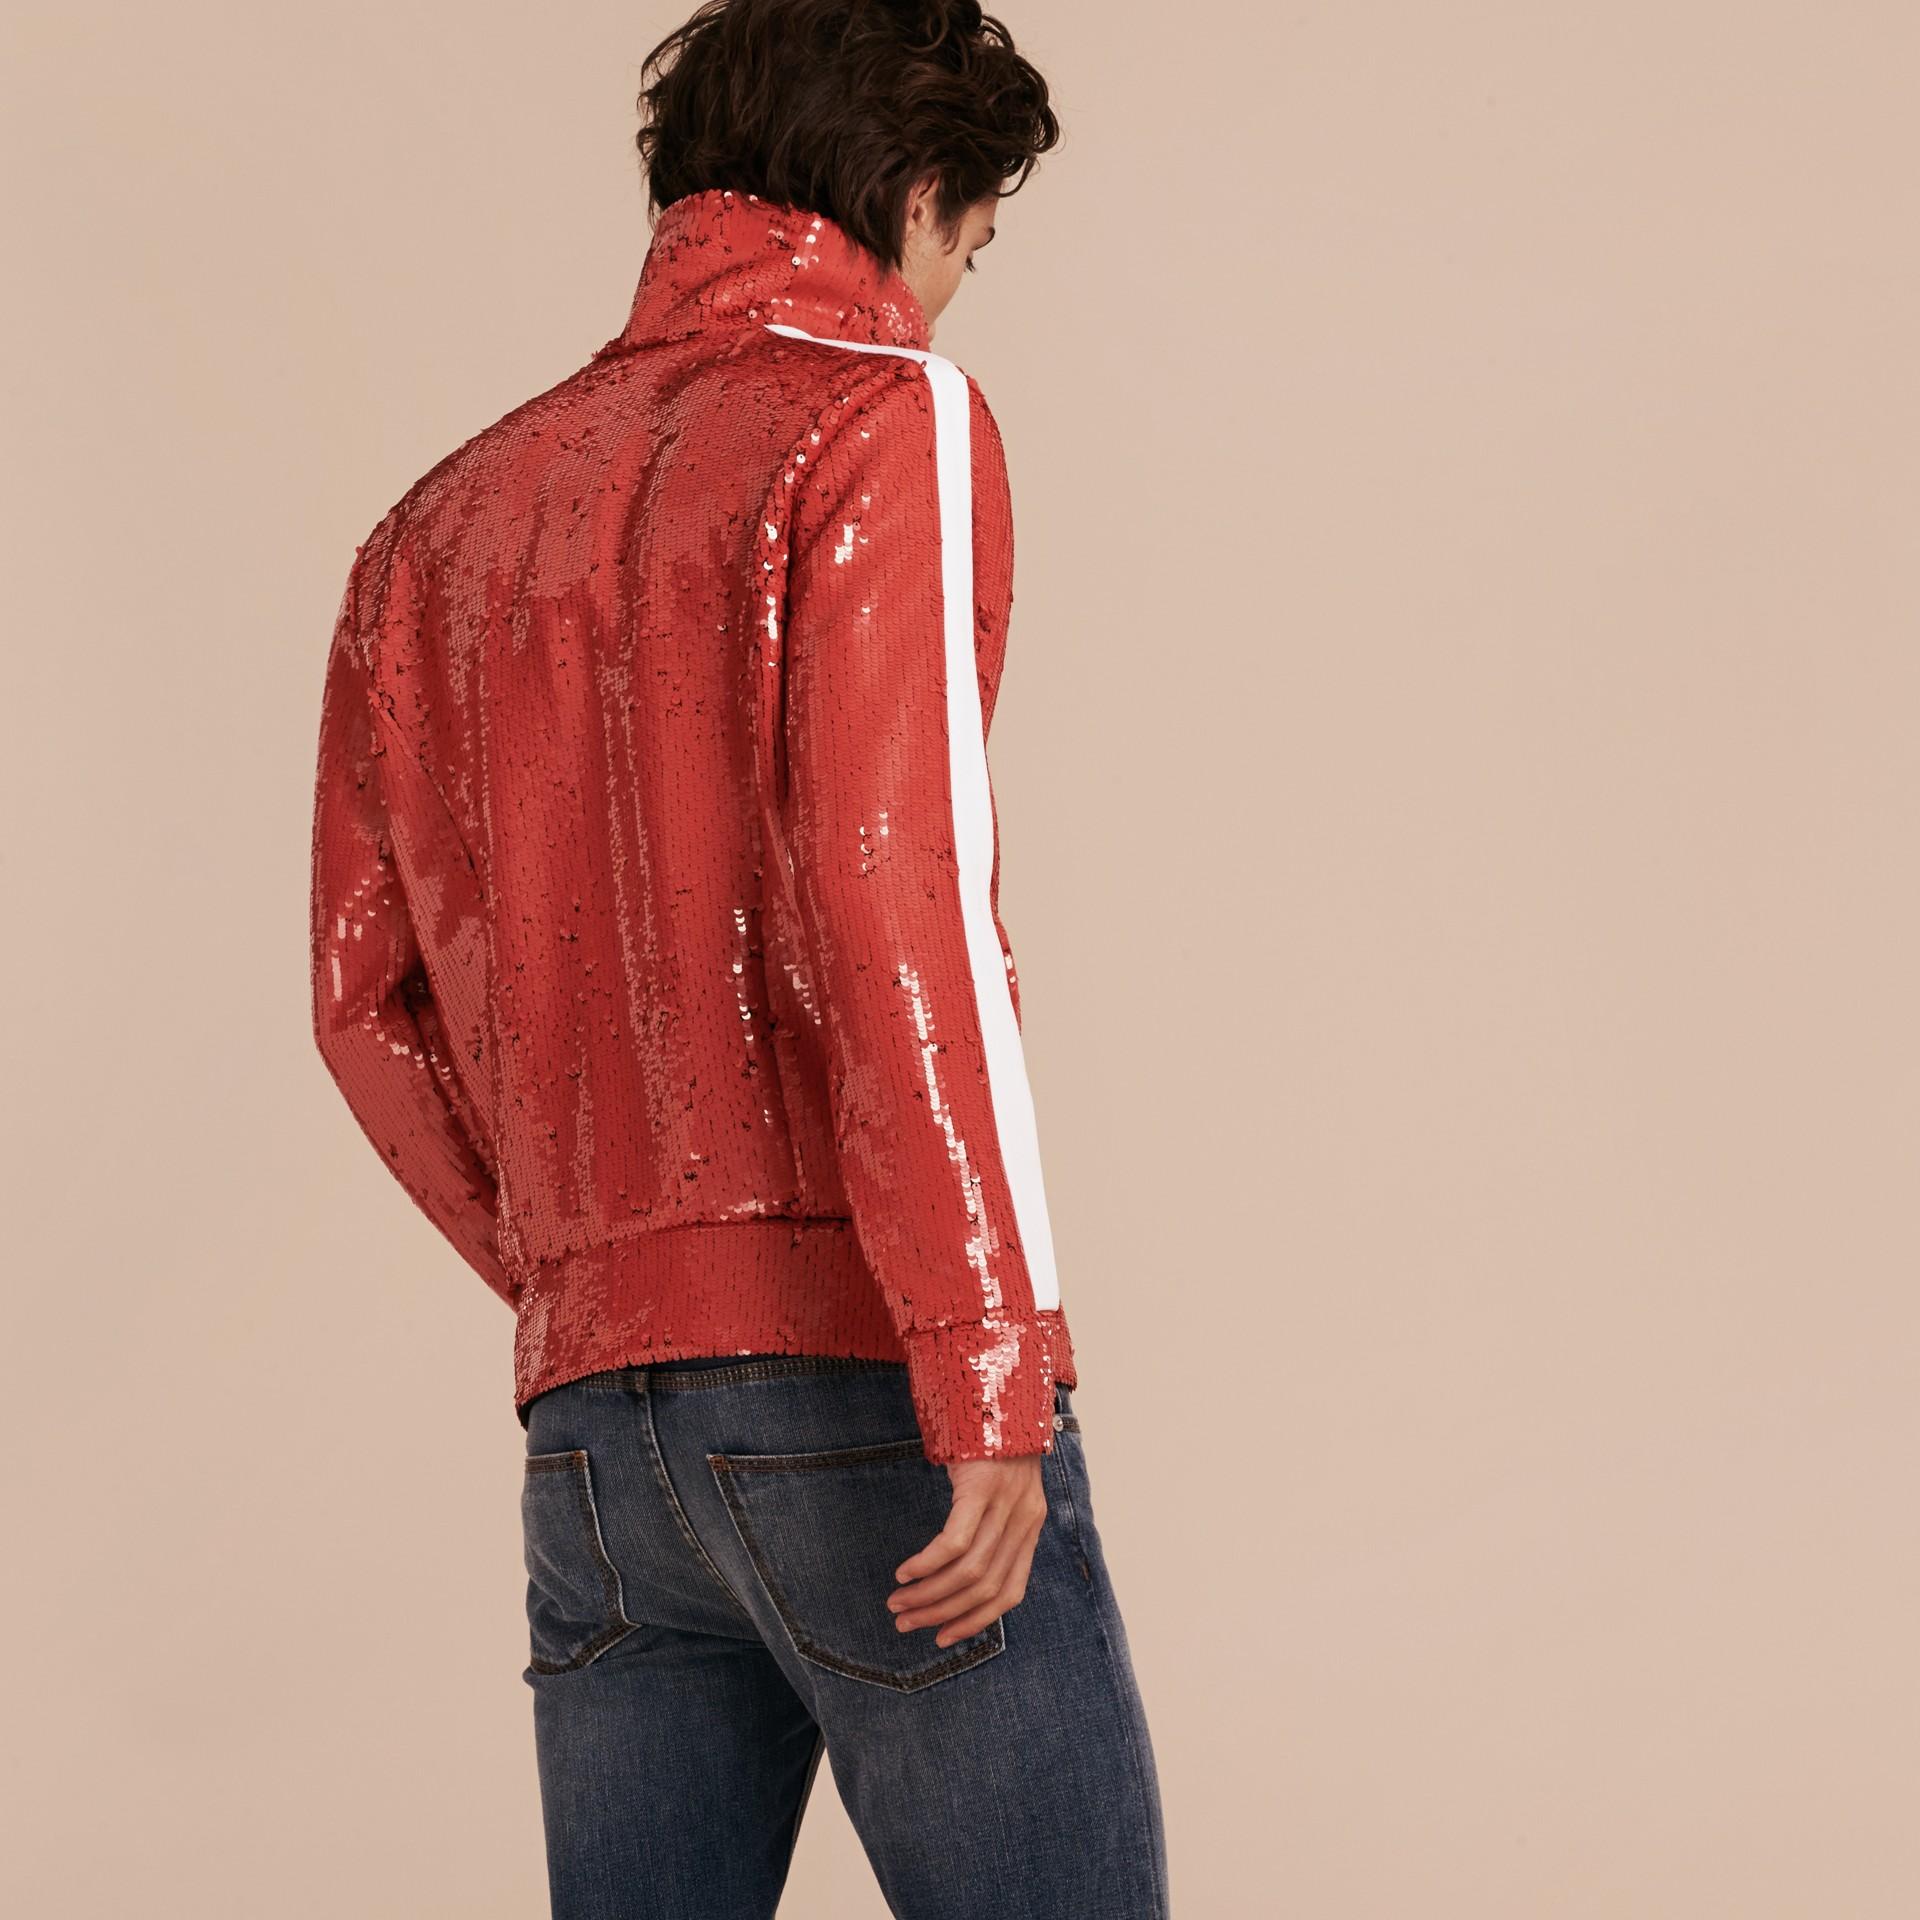 Cranberry-rot Trainingsjacke mit Pailletten - Galerie-Bild 3